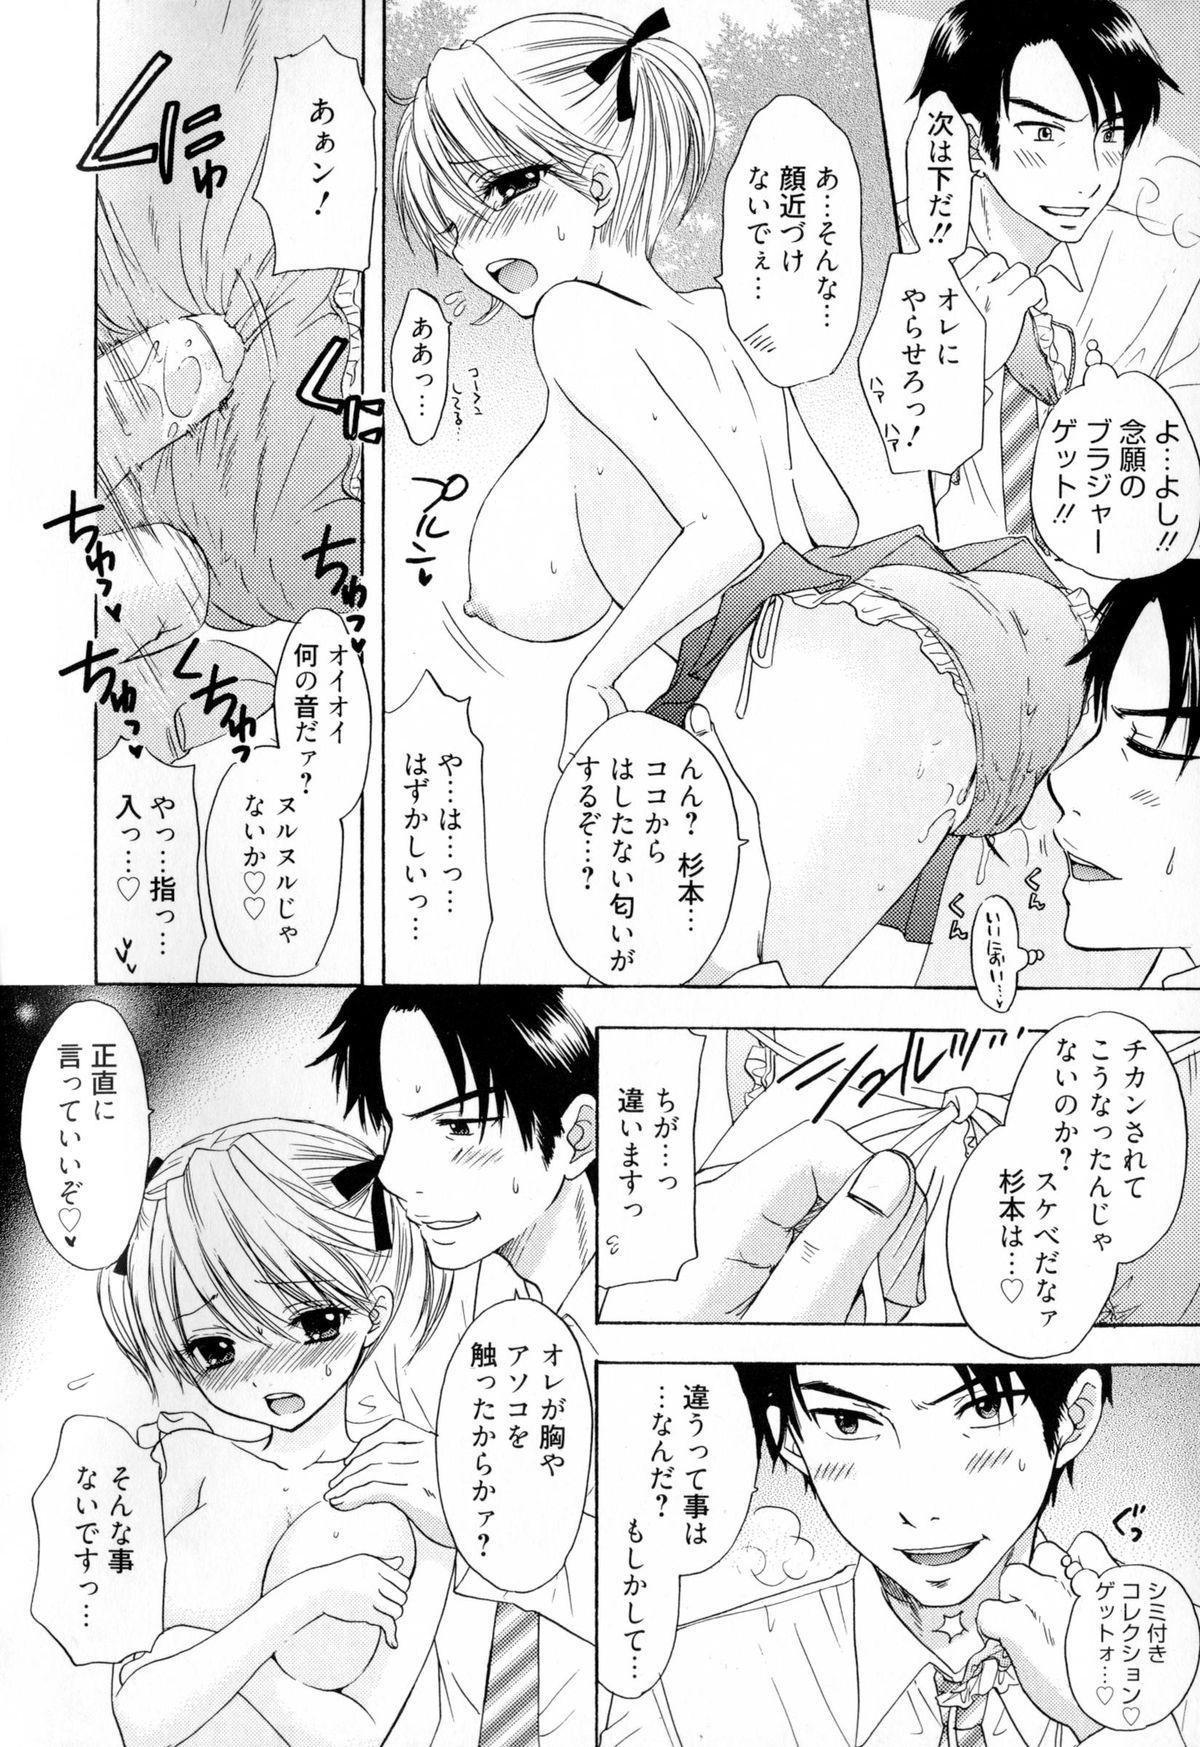 The Great Escape 4 Shokai Genteiban 9